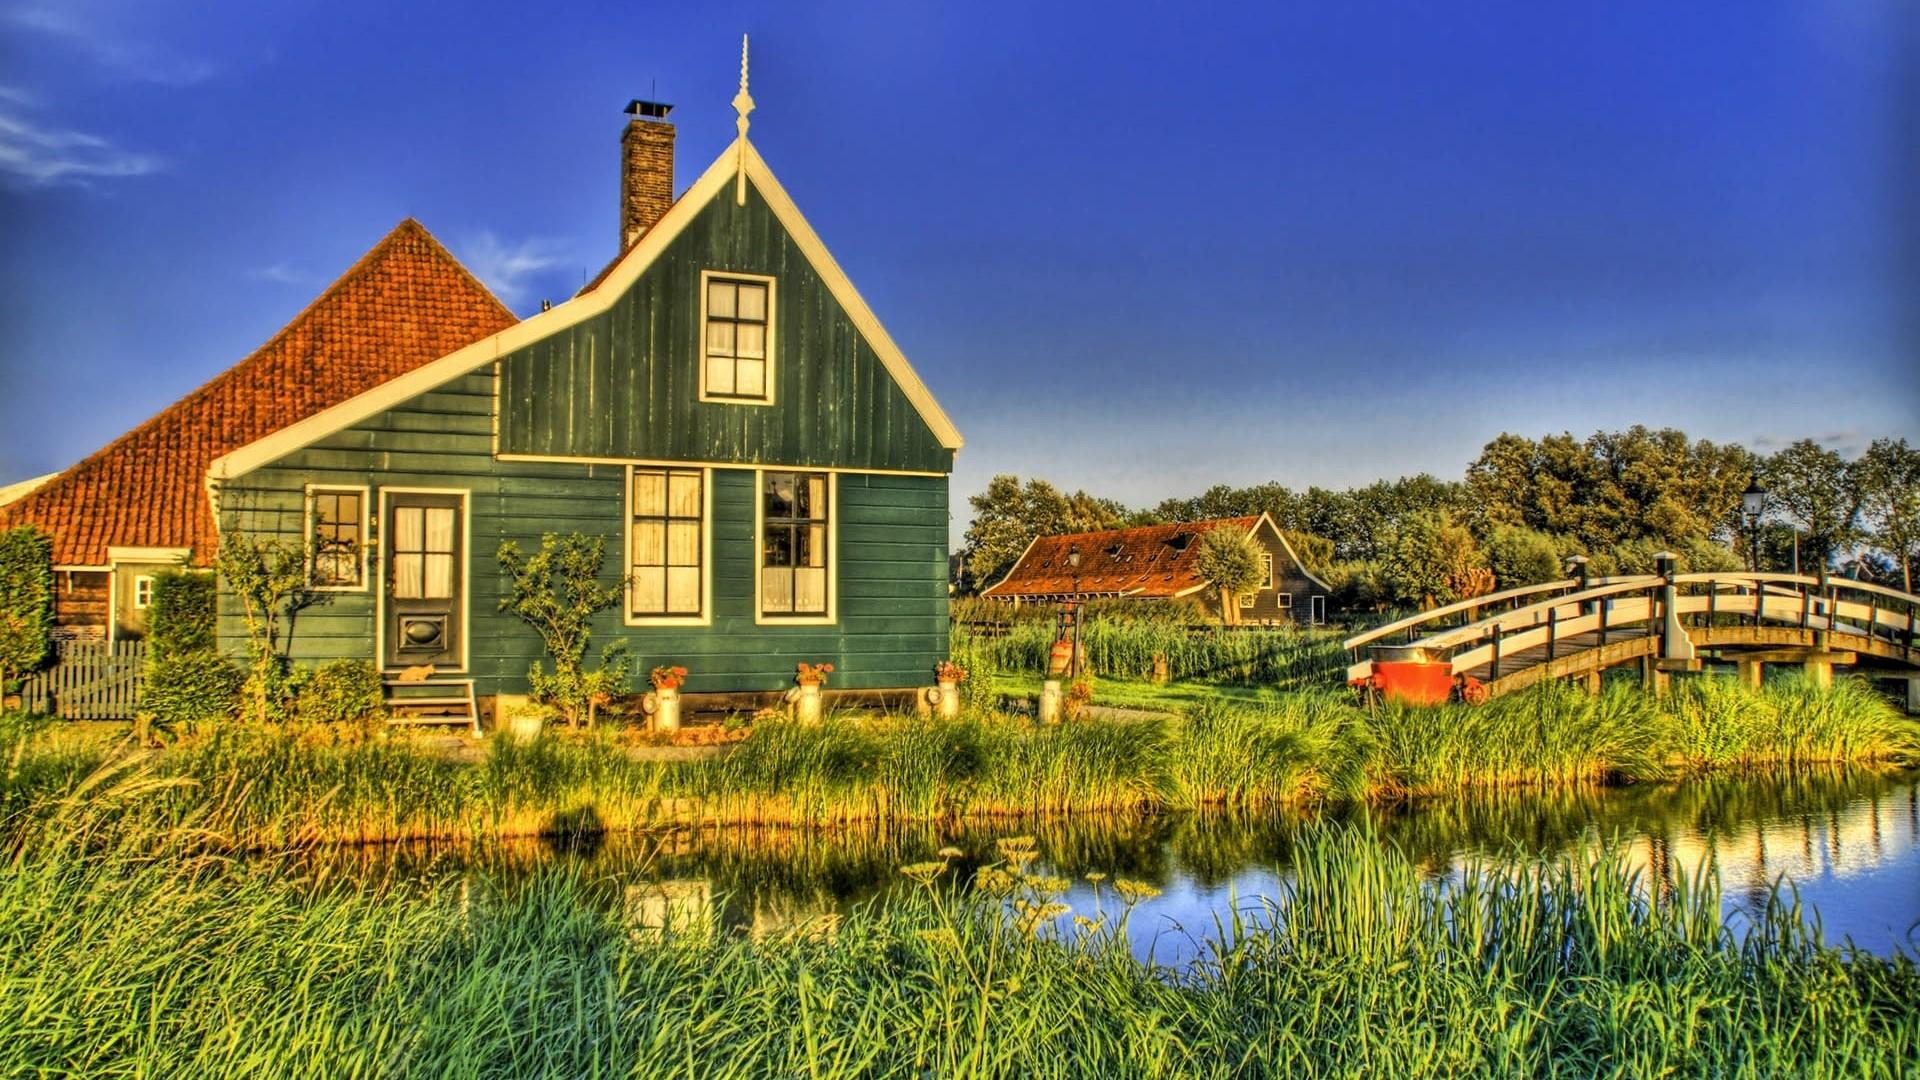 Preview wallpaper village, house, bridge, river, grass, sky, summer,